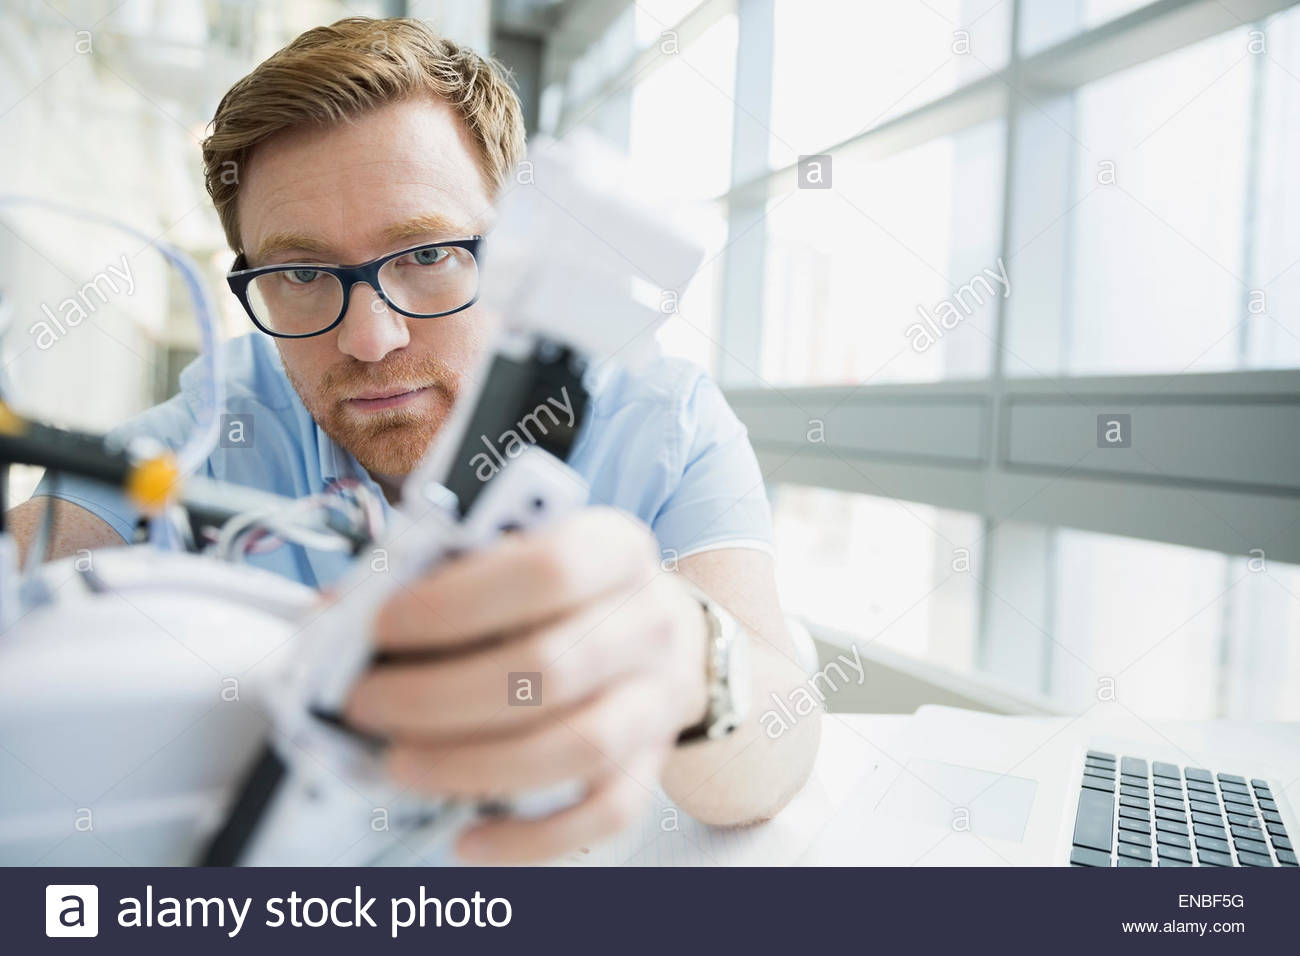 Focused engineer examining robot - Stock Image